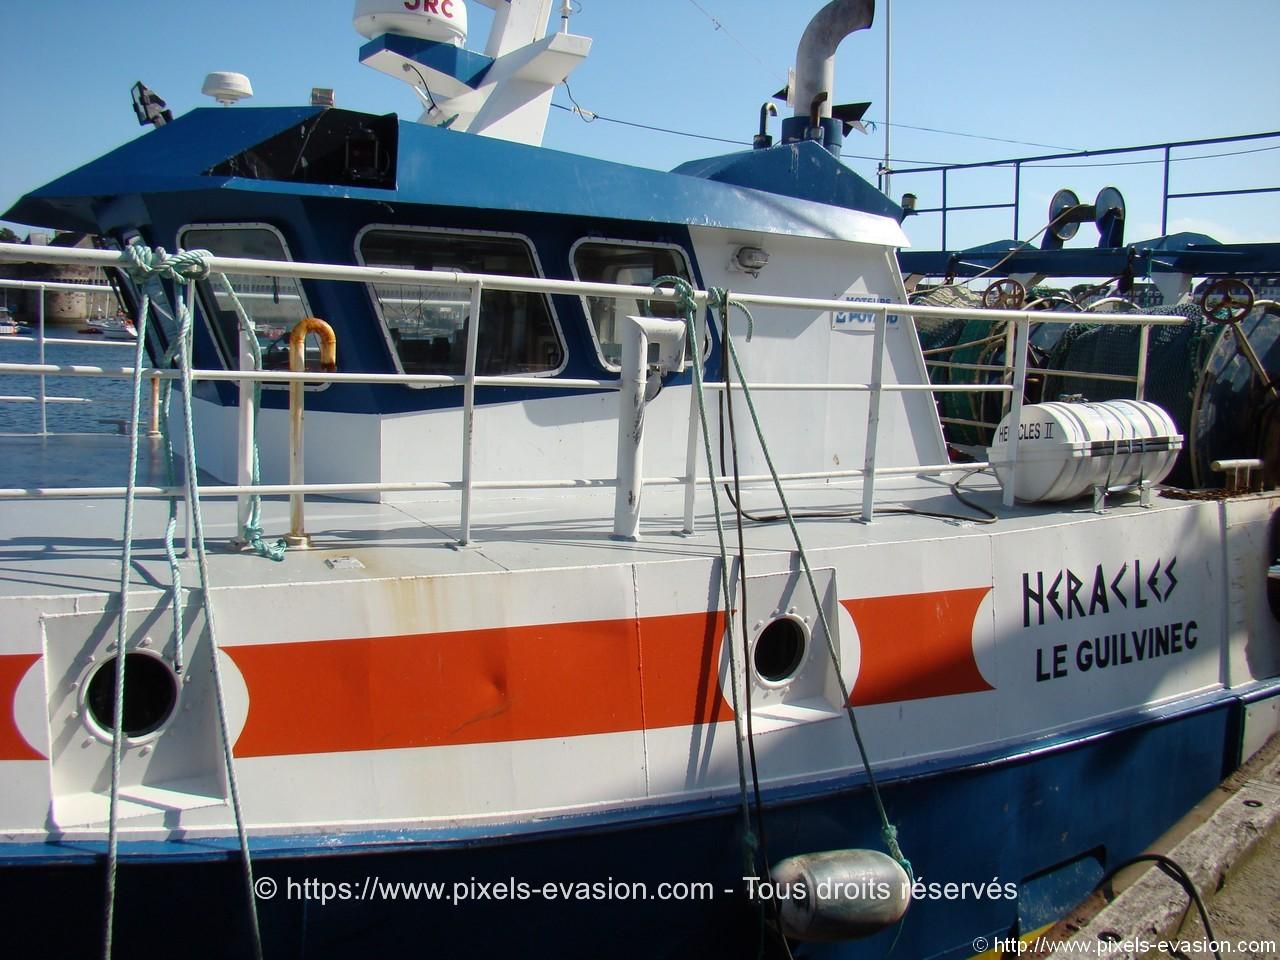 Heracles II (GV 898445)